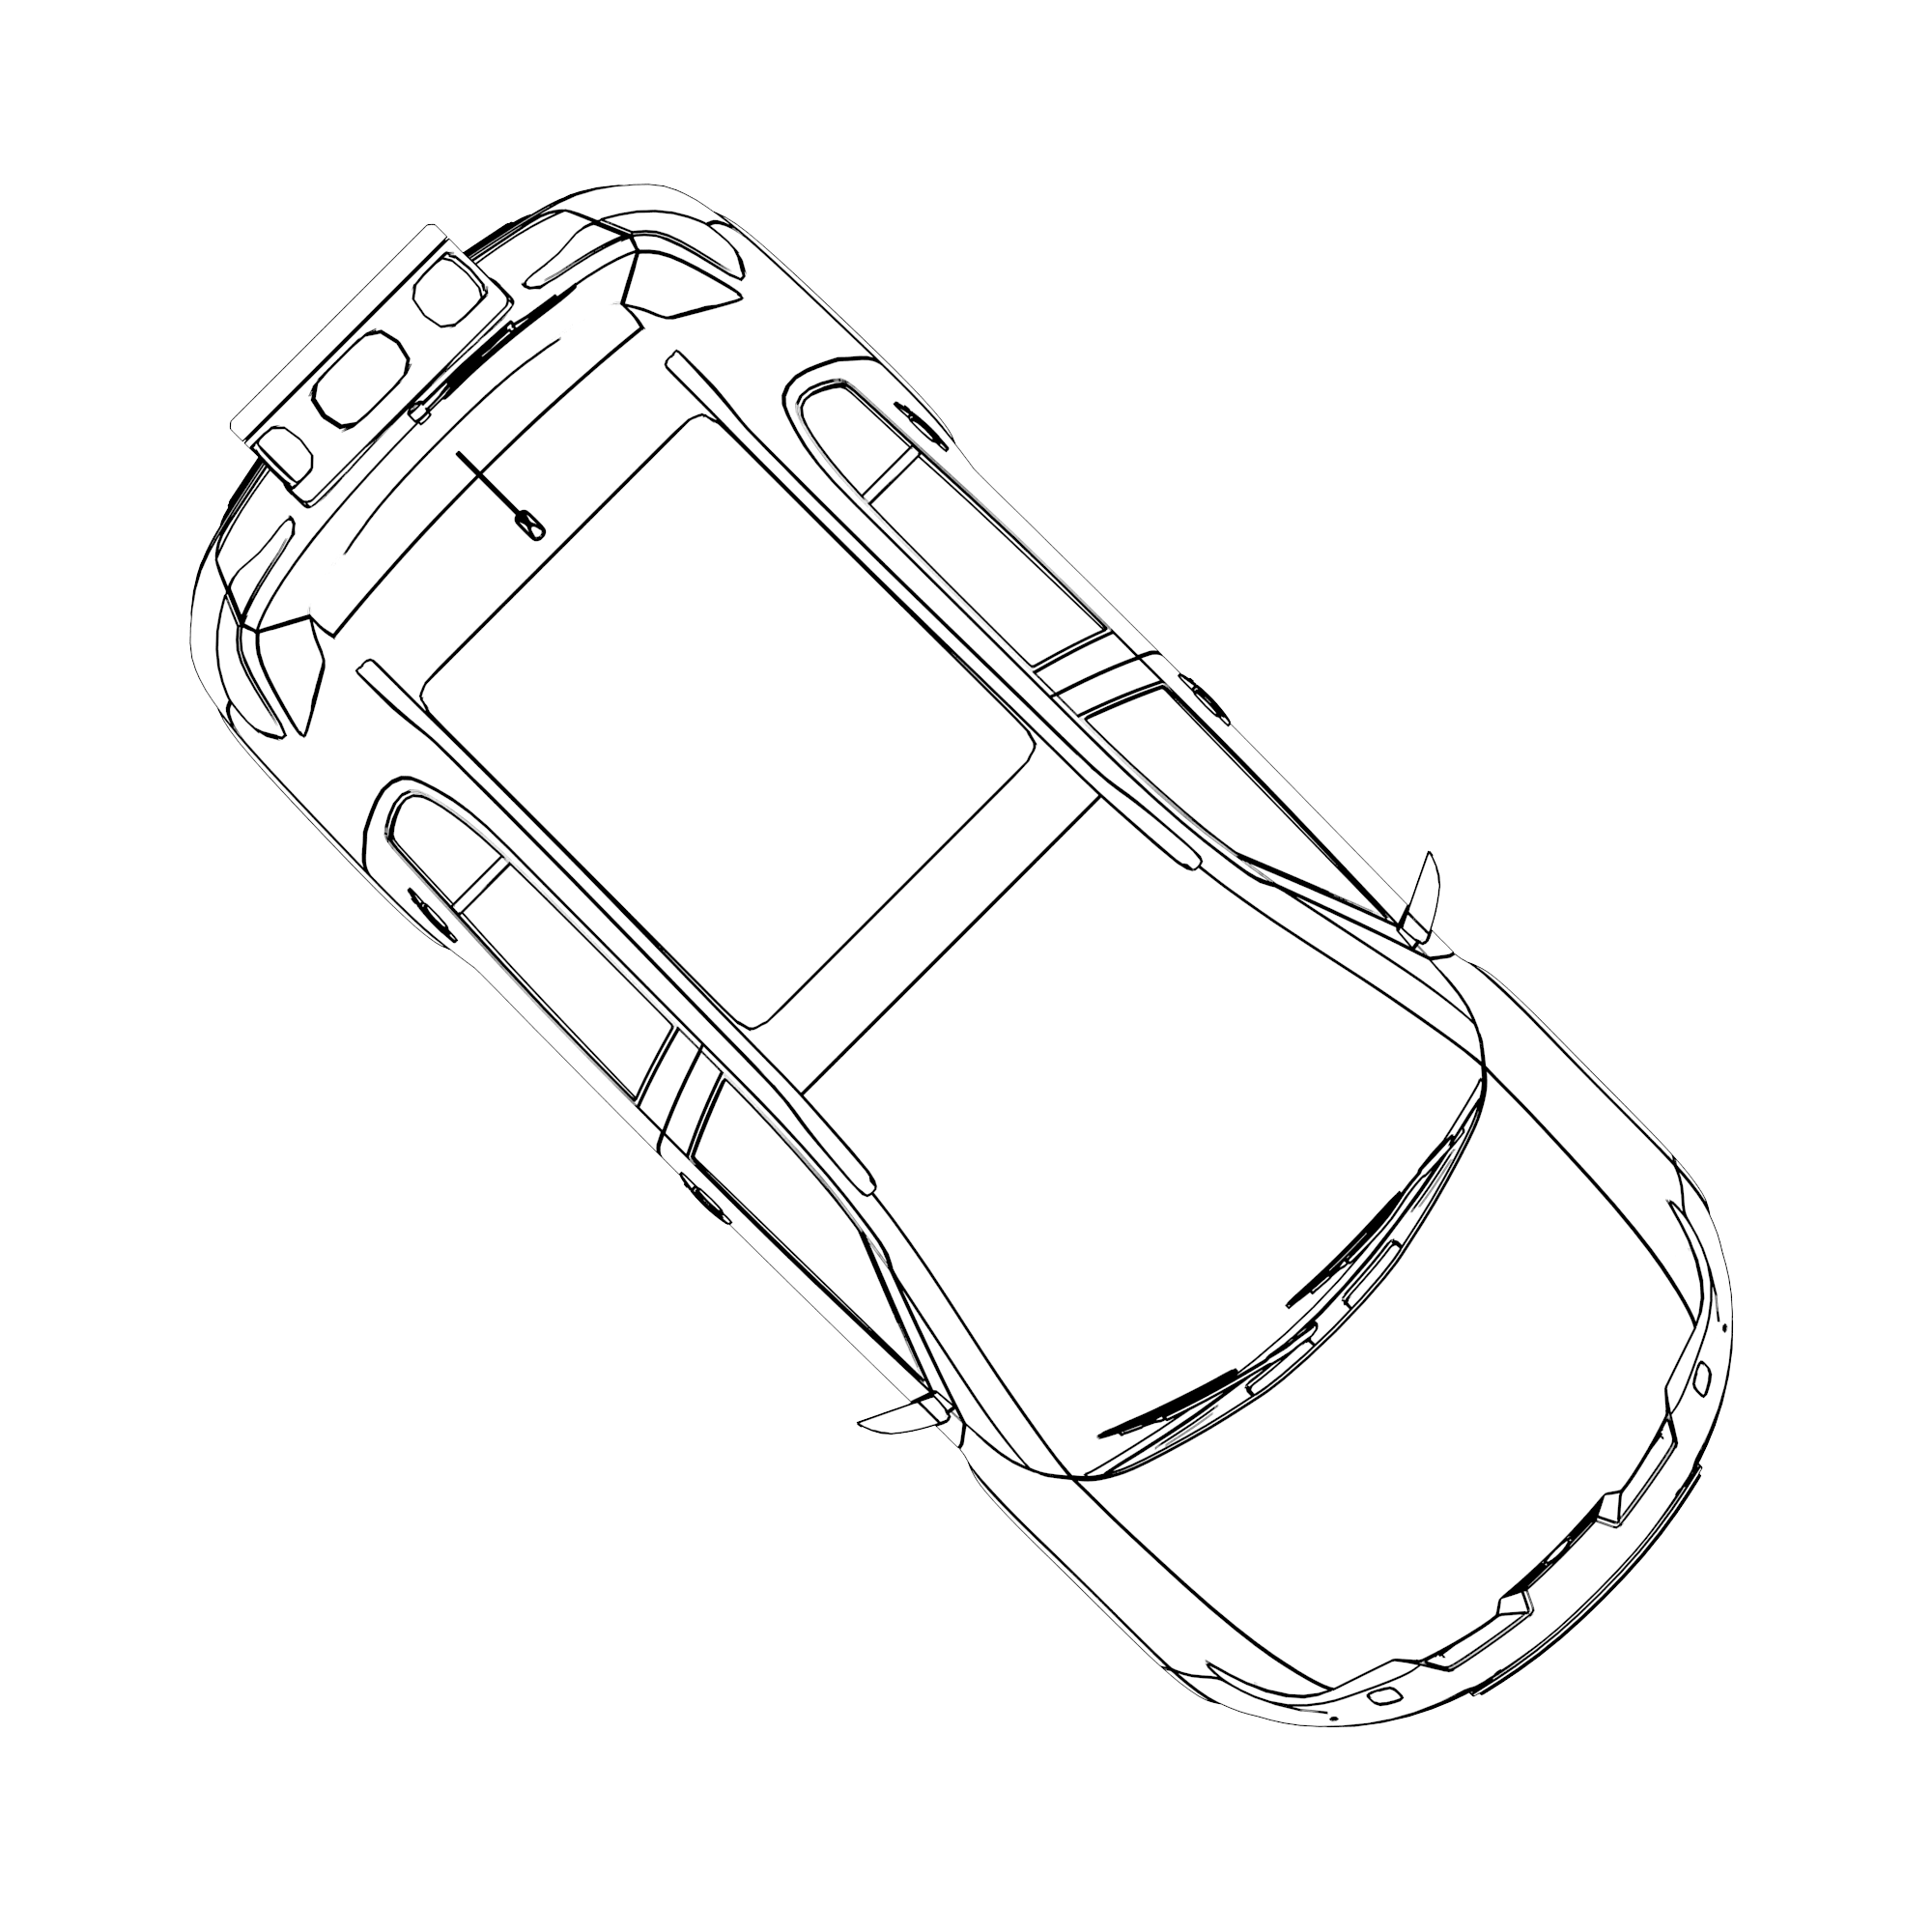 MSI_SUV_top_11-12_v1.png